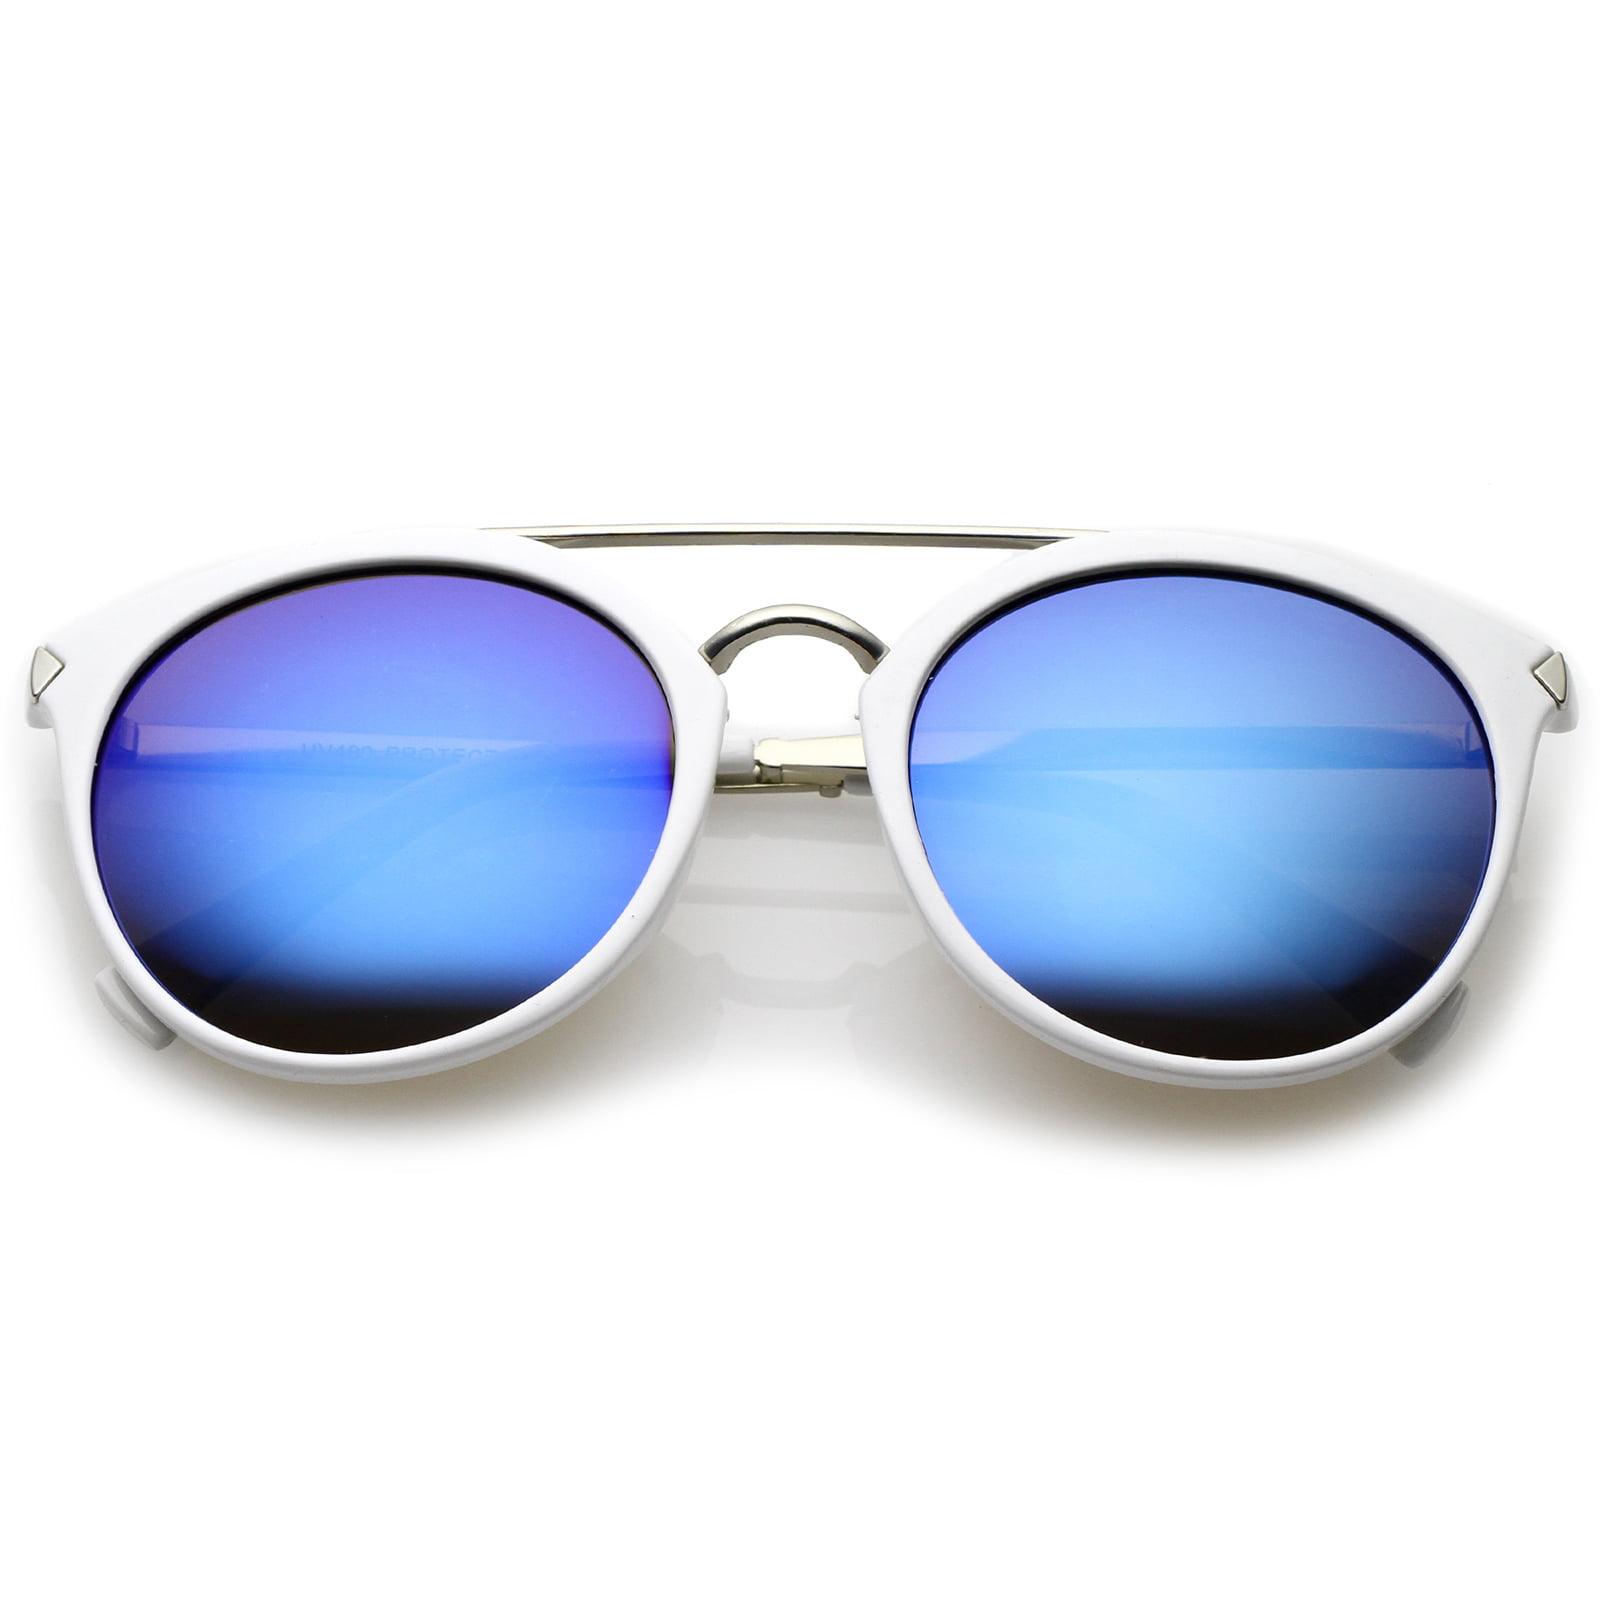 sunglassLA - Modern Double Bridge Colored Mirror Lens Round Aviator Sunglasses 57mm - 57mm